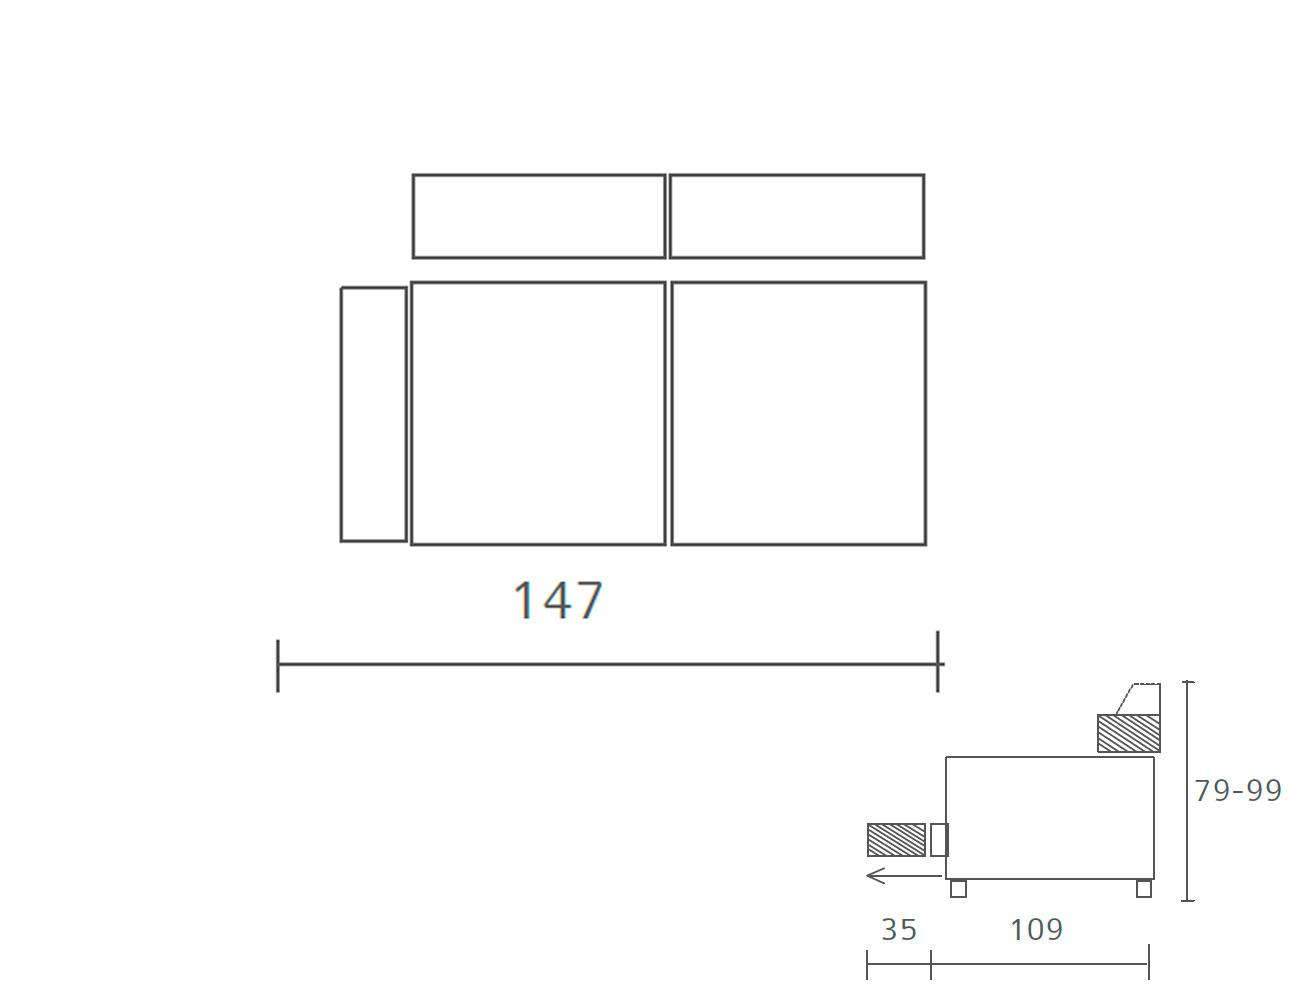 Sofa piel 2 plazas 1471